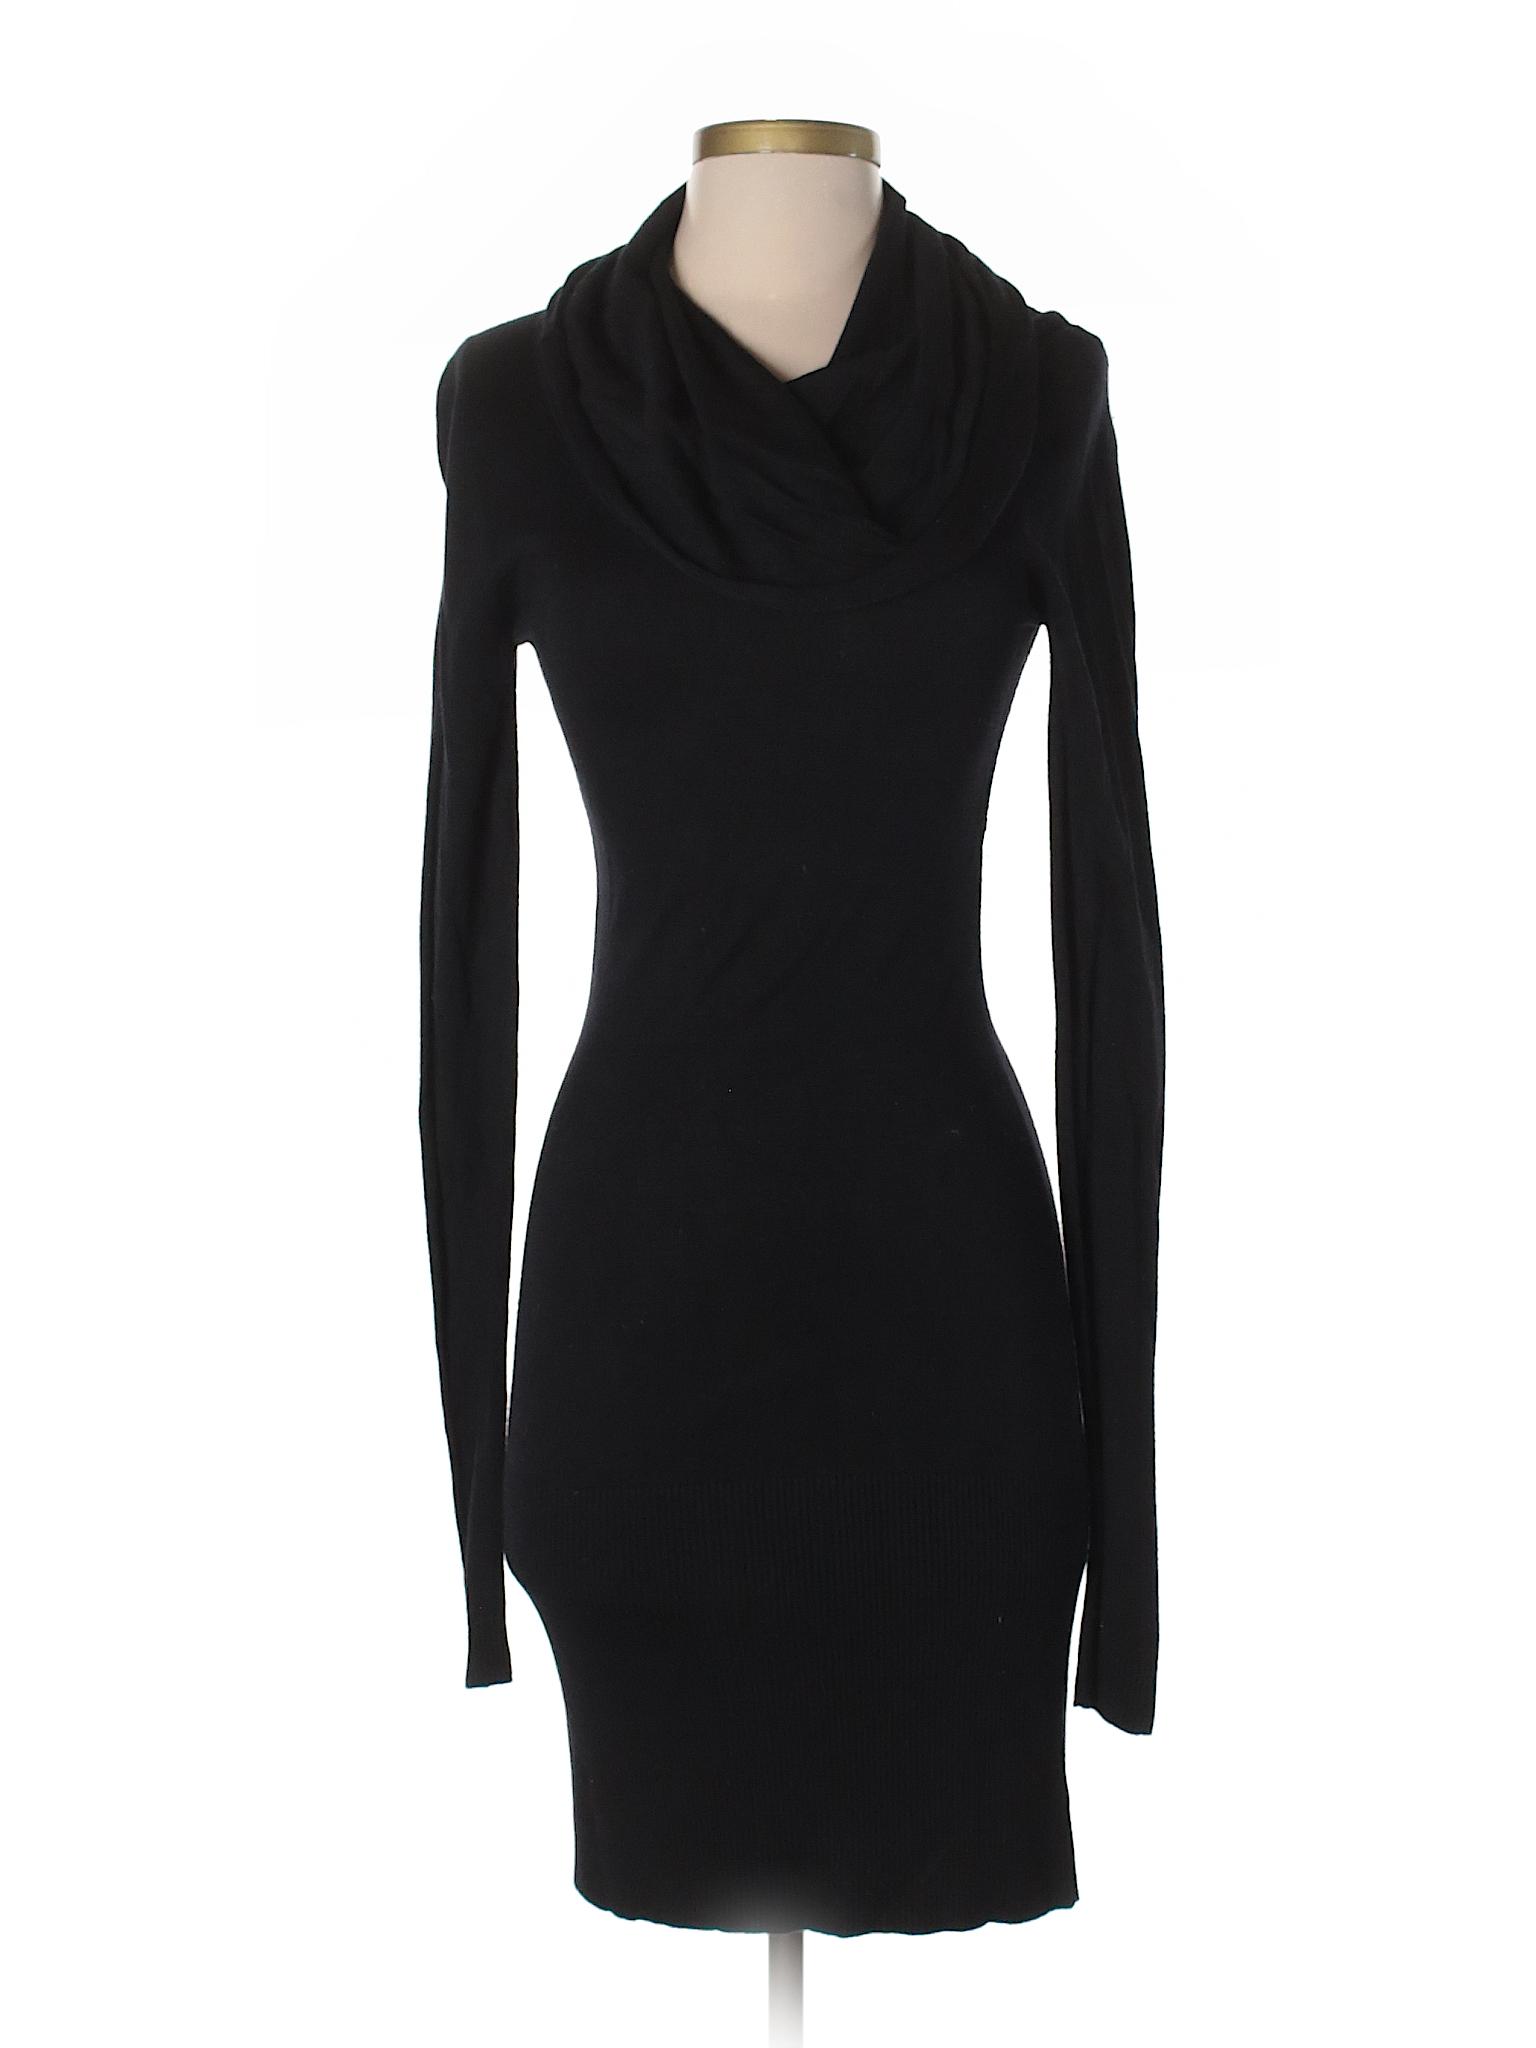 winter LinQ Casual LinQ Boutique Dress Casual winter Boutique Dress qUwgf6f1